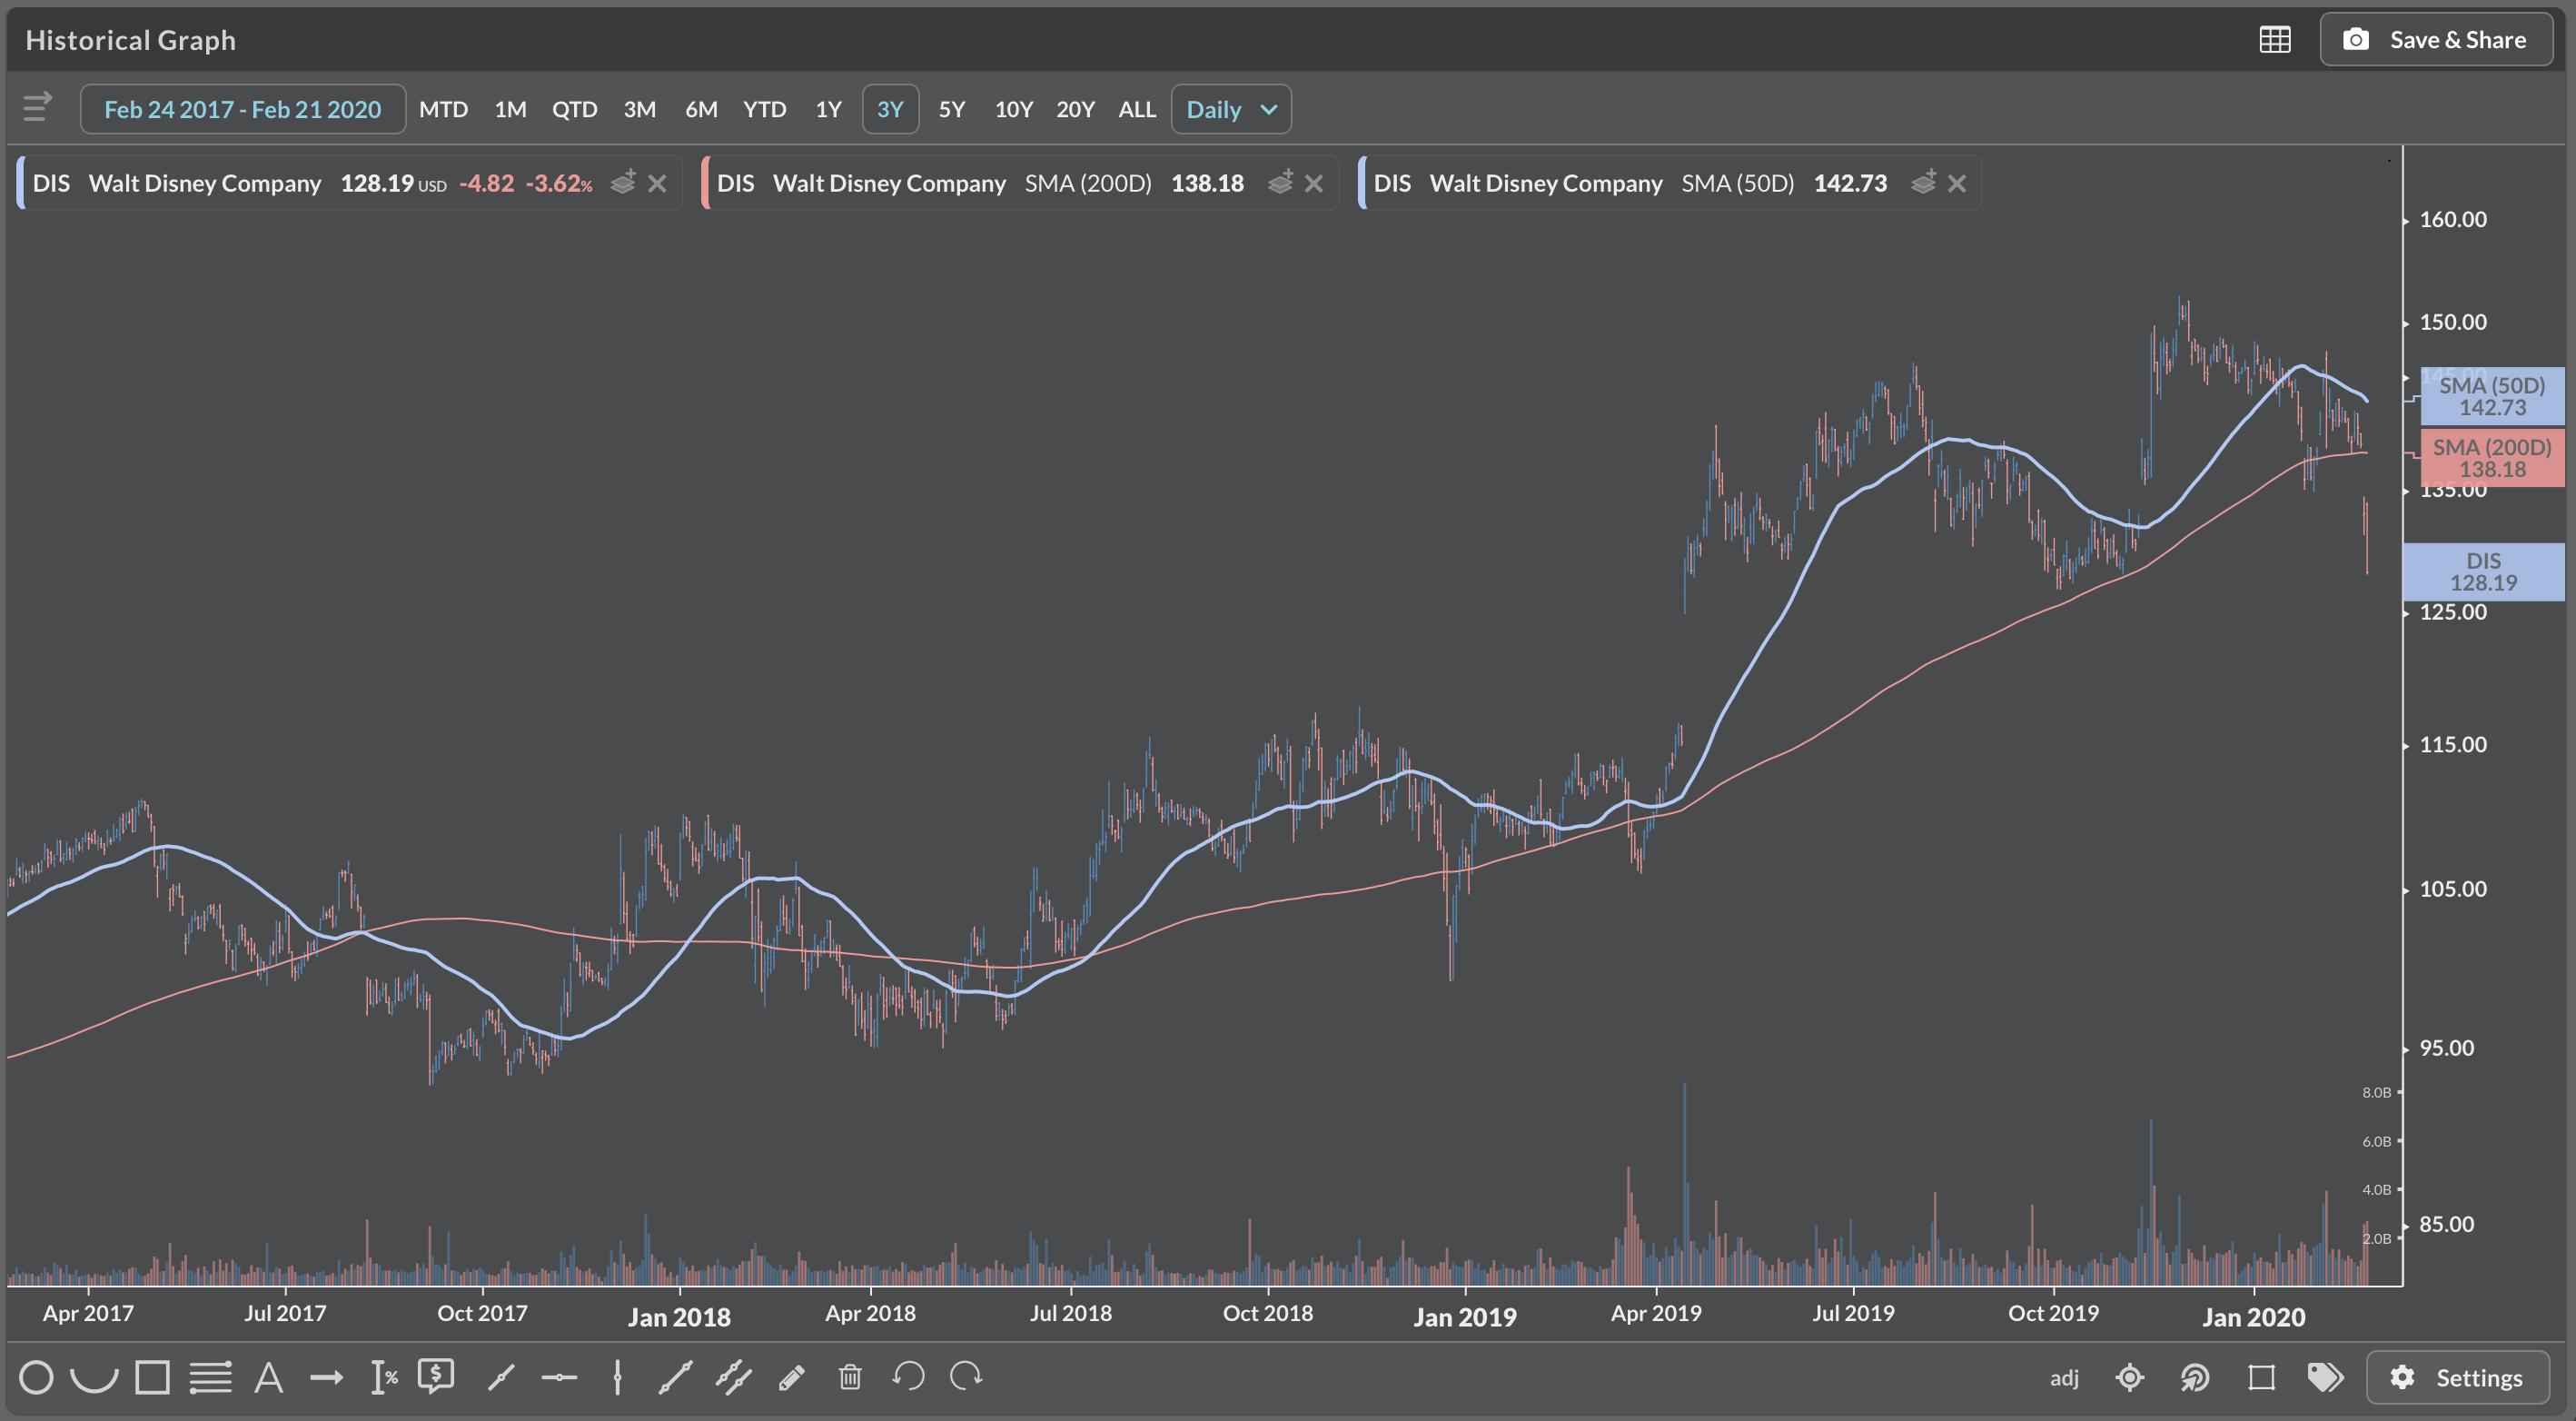 Disney share price following Bob Iger departure